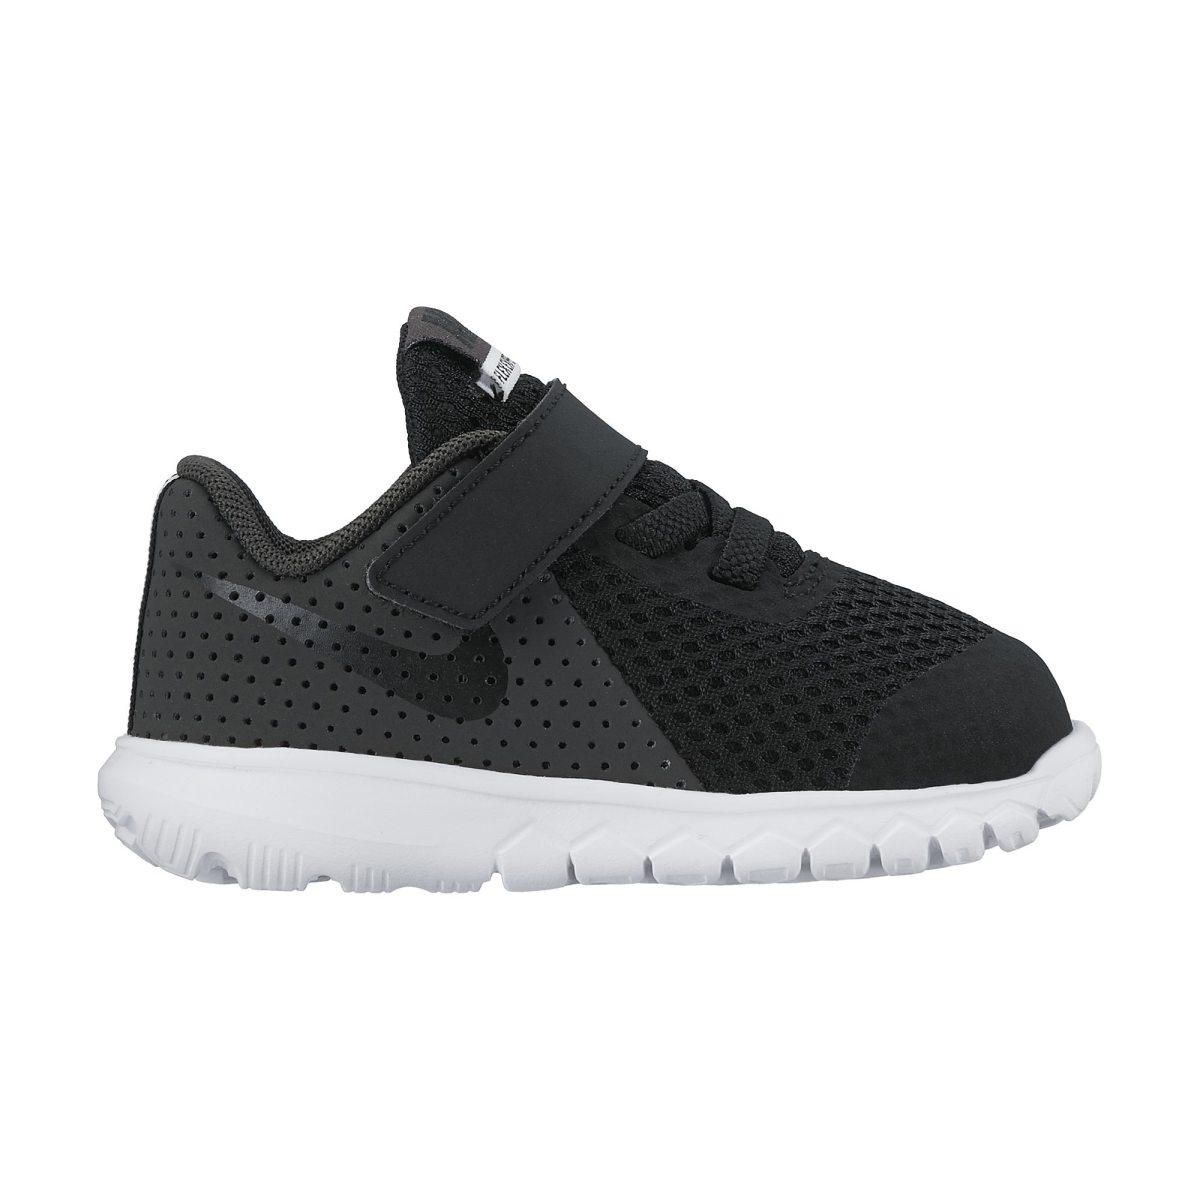 SkoXxl Experience Flex rn Nike 5tdvFritidsskoSmB wPnO0k